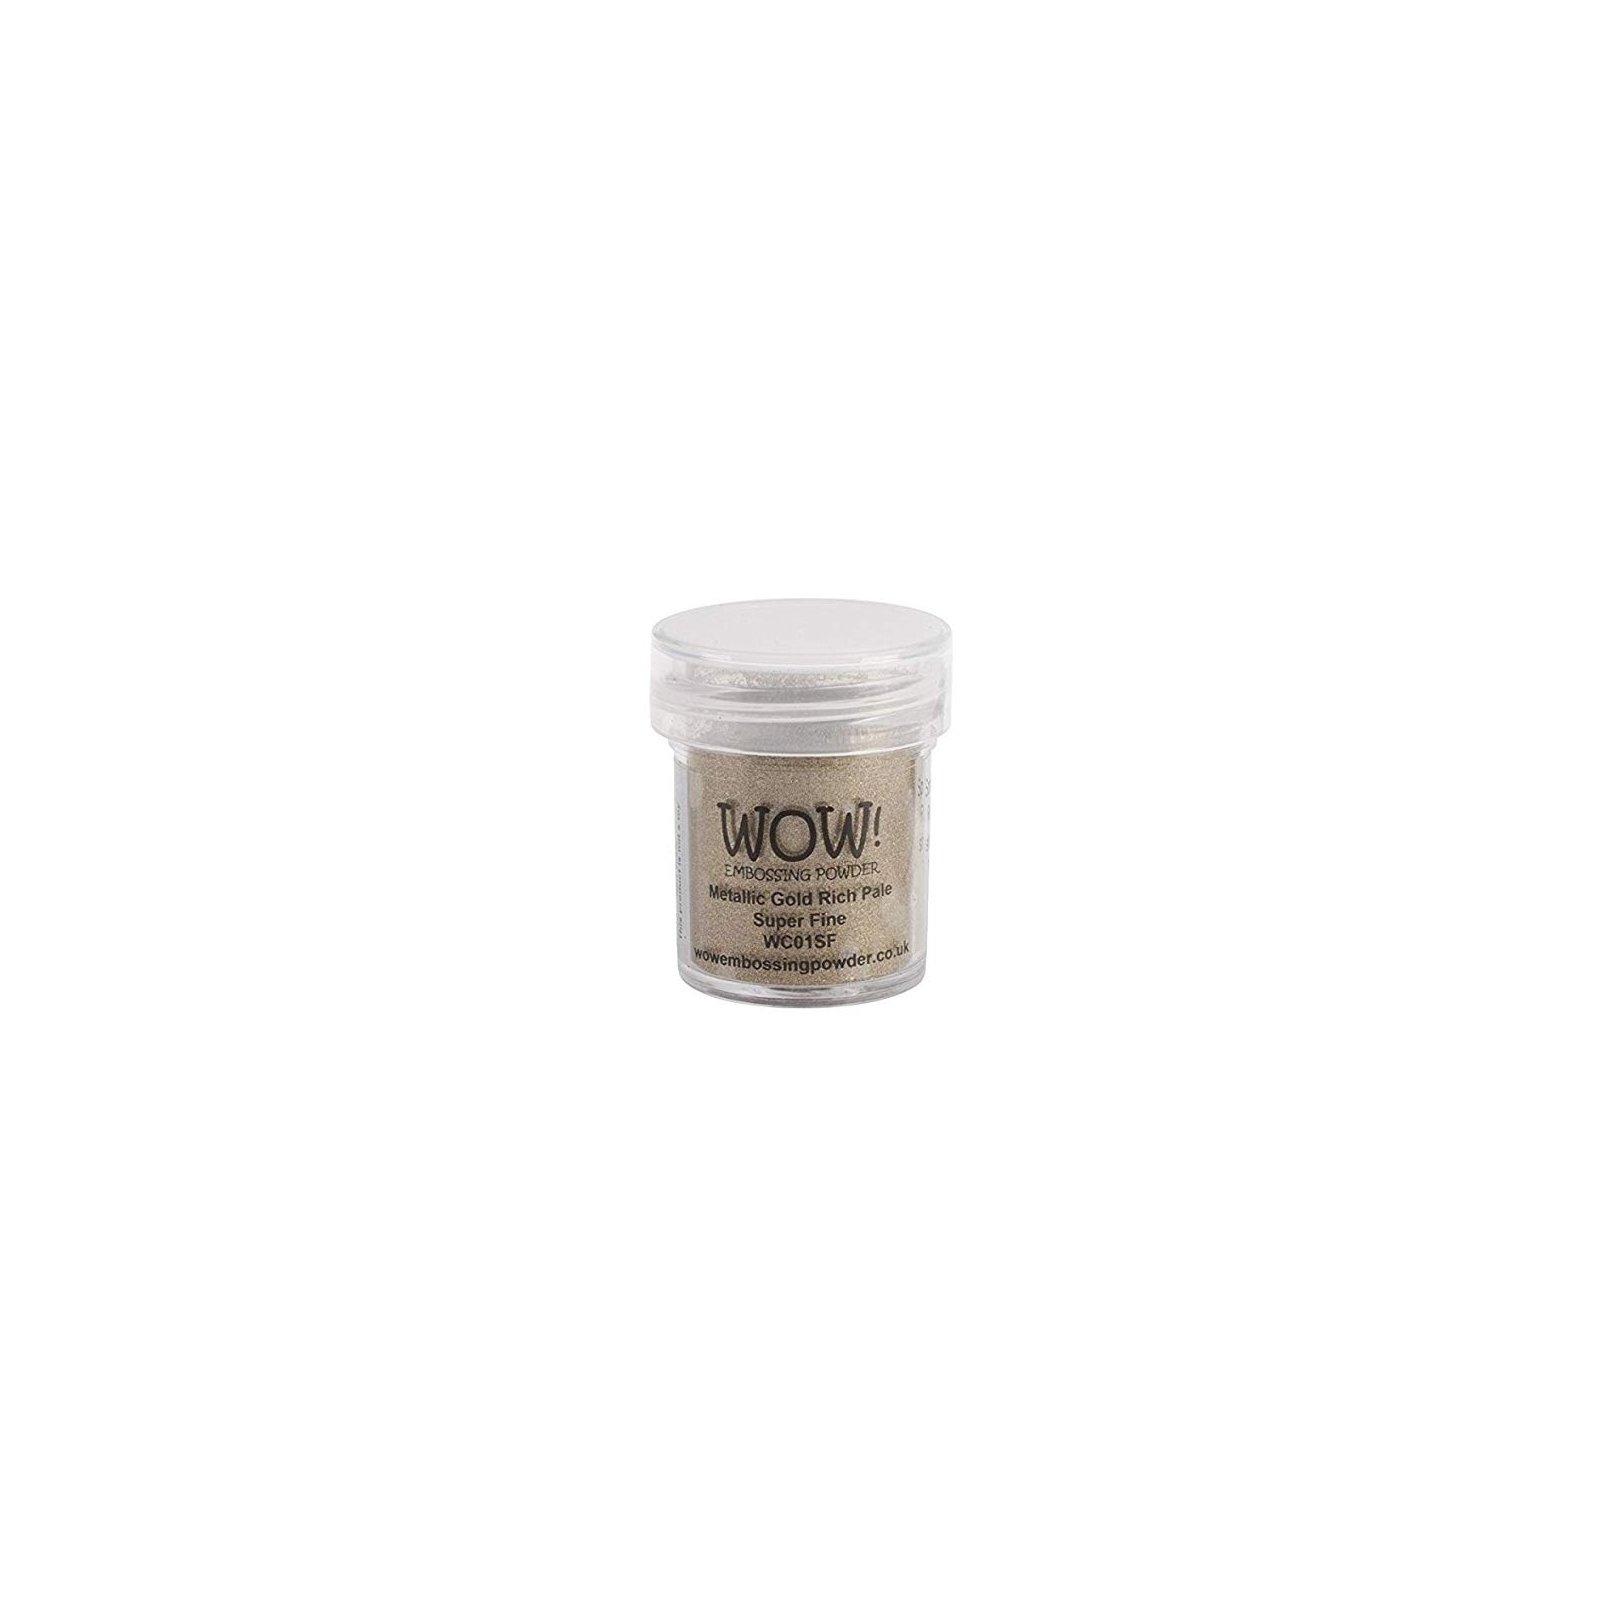 Poudre à embosser - Or - Metallic Gold Rich Pale - Super Fine - WOW!